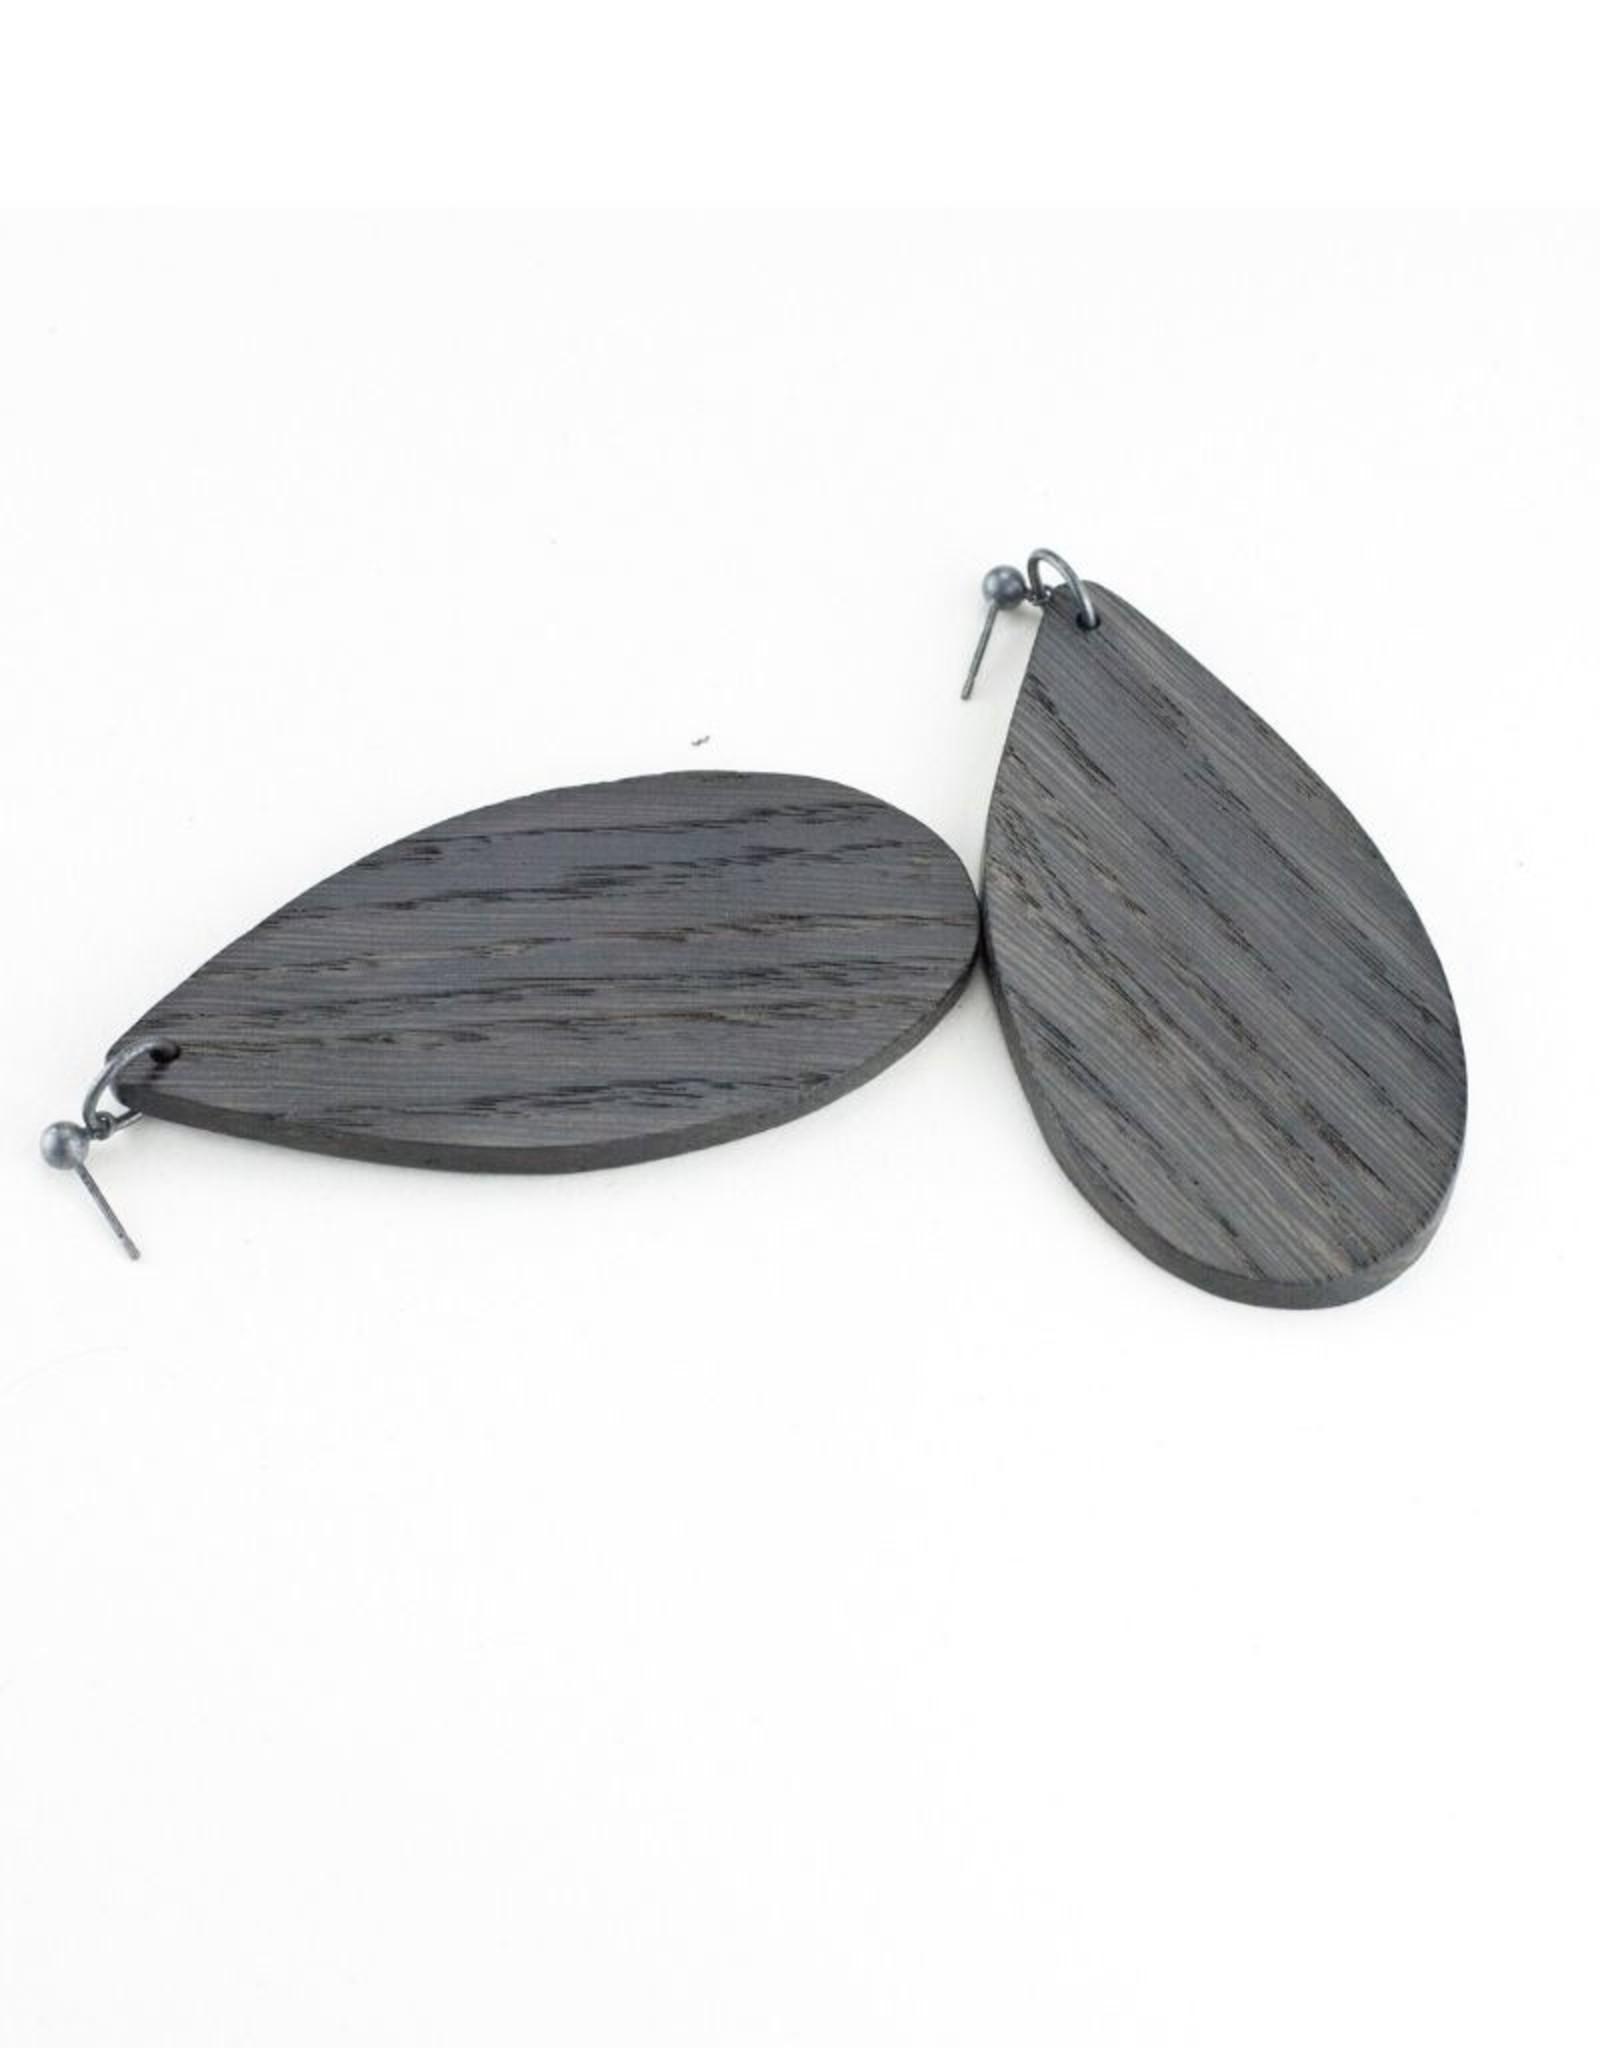 Leko & Leko Jewellery Leko & Leko - Iconsi Earrings